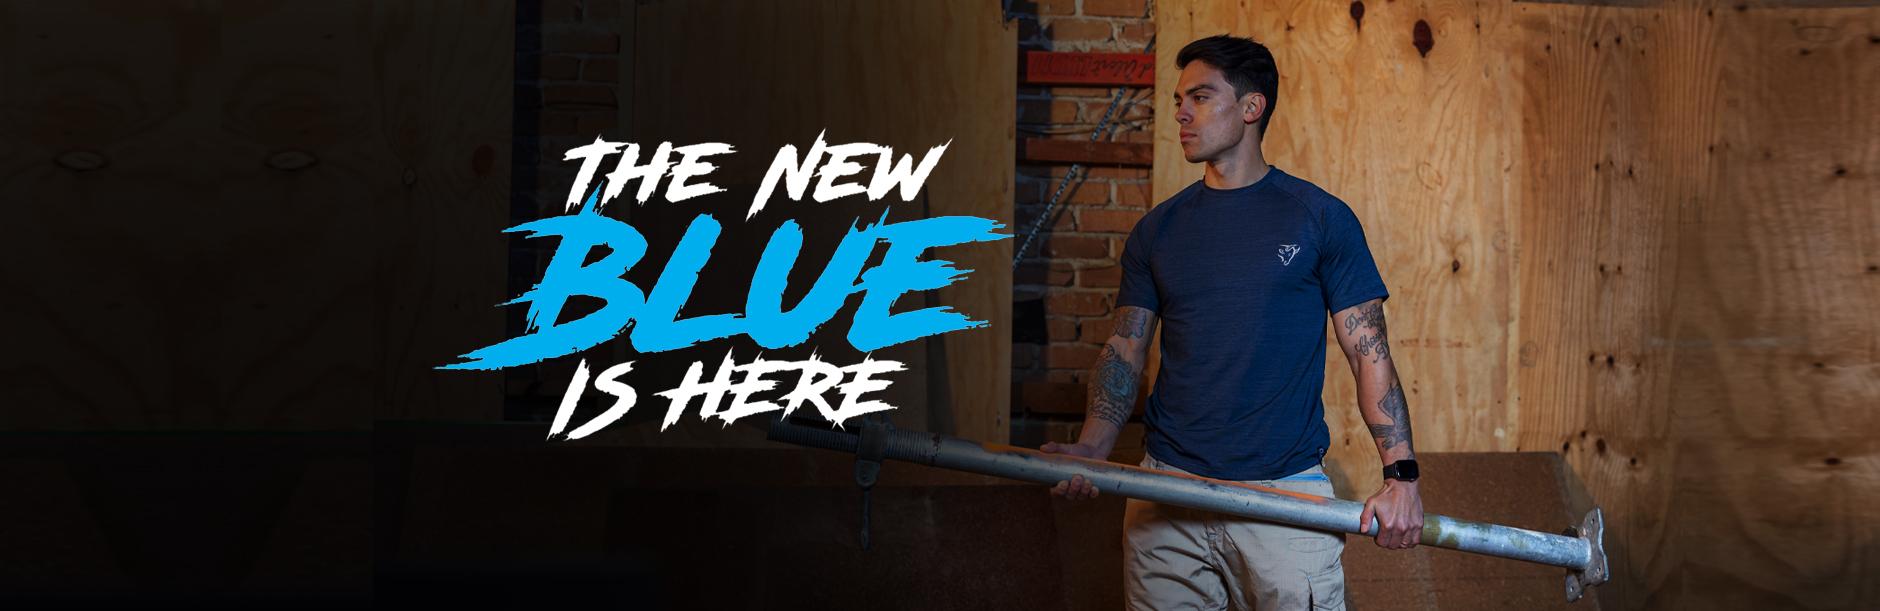 AU_NZ_The New Blue